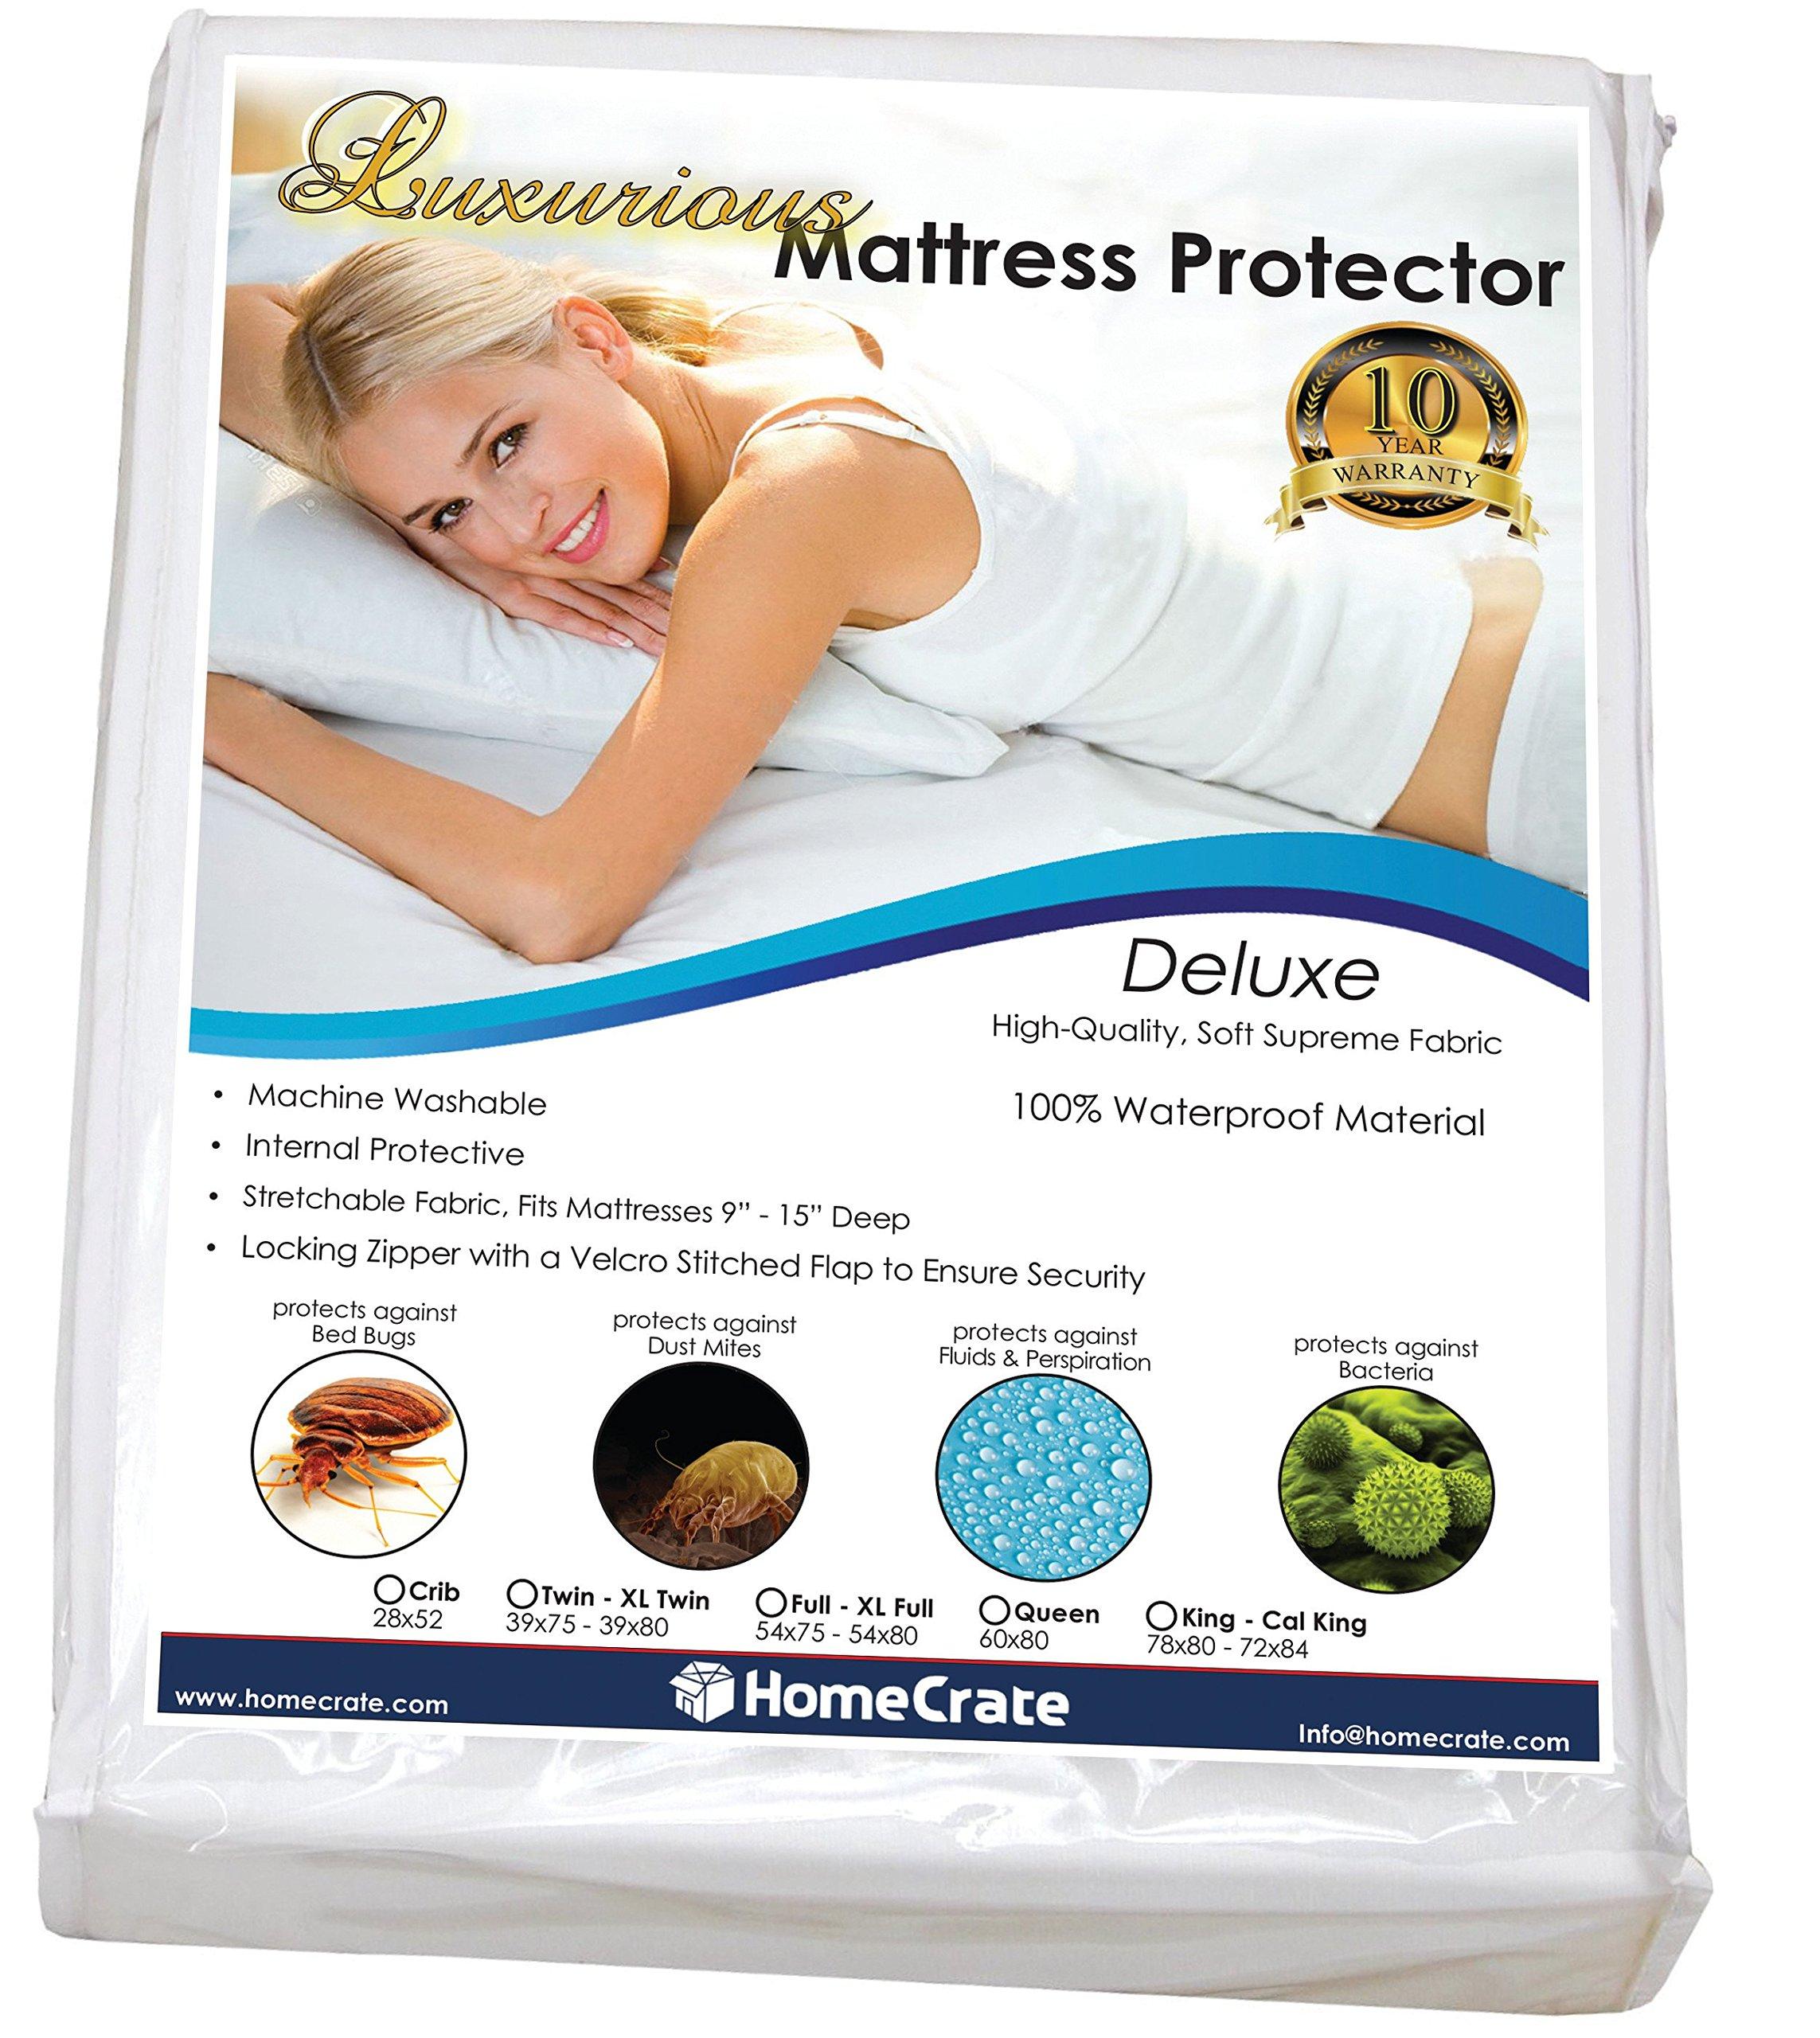 HomeCrate Natural Sleep Defence - Luxurious Waterproof/Bed Bug Proof Mattress Encasement - 78'' 80'' King,